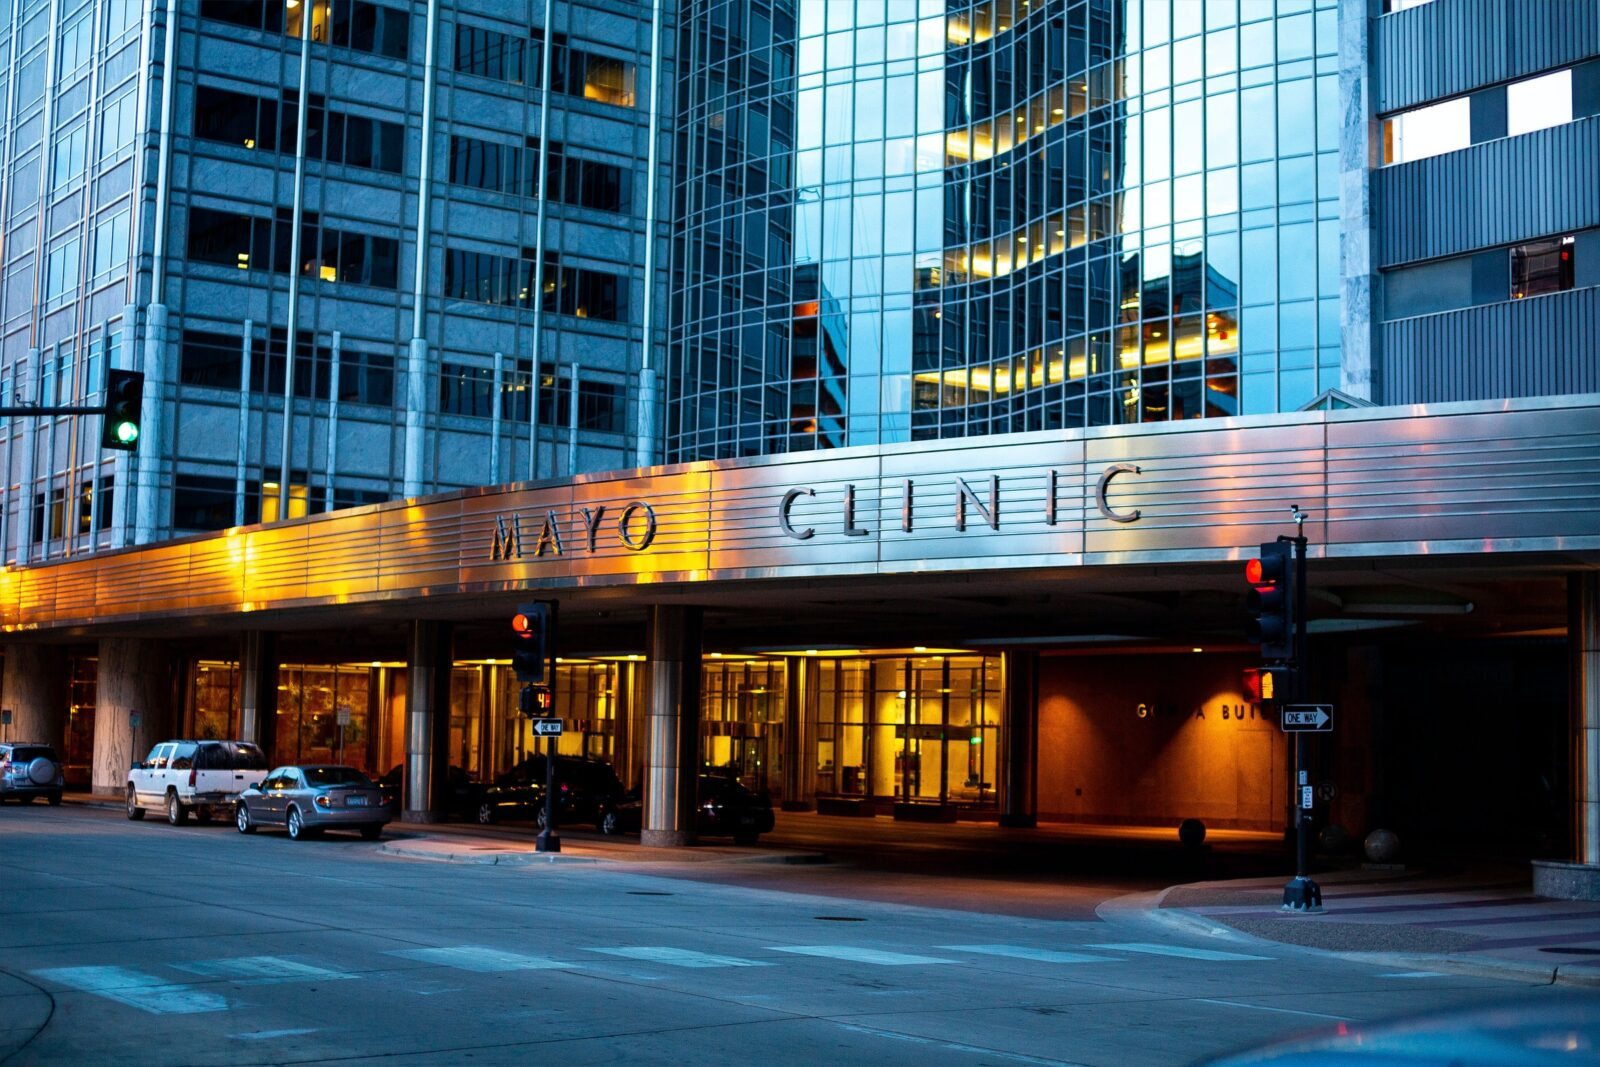 Entrance to the Mayo Clinic Hospital